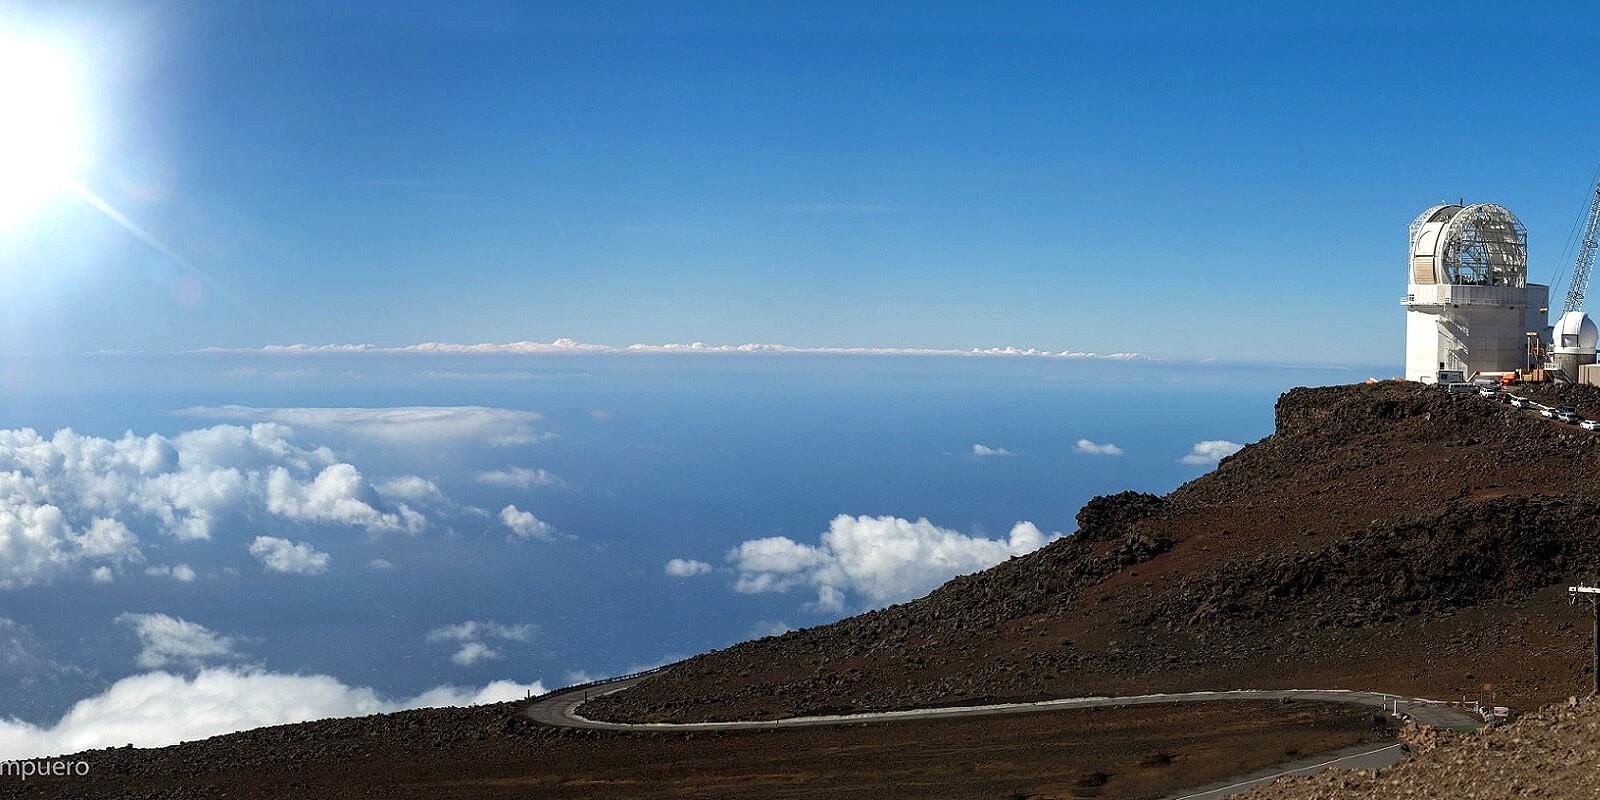 DKIST_Solar_Telescope_ATST_Maui_Hawaii_Idom_ADA_03_